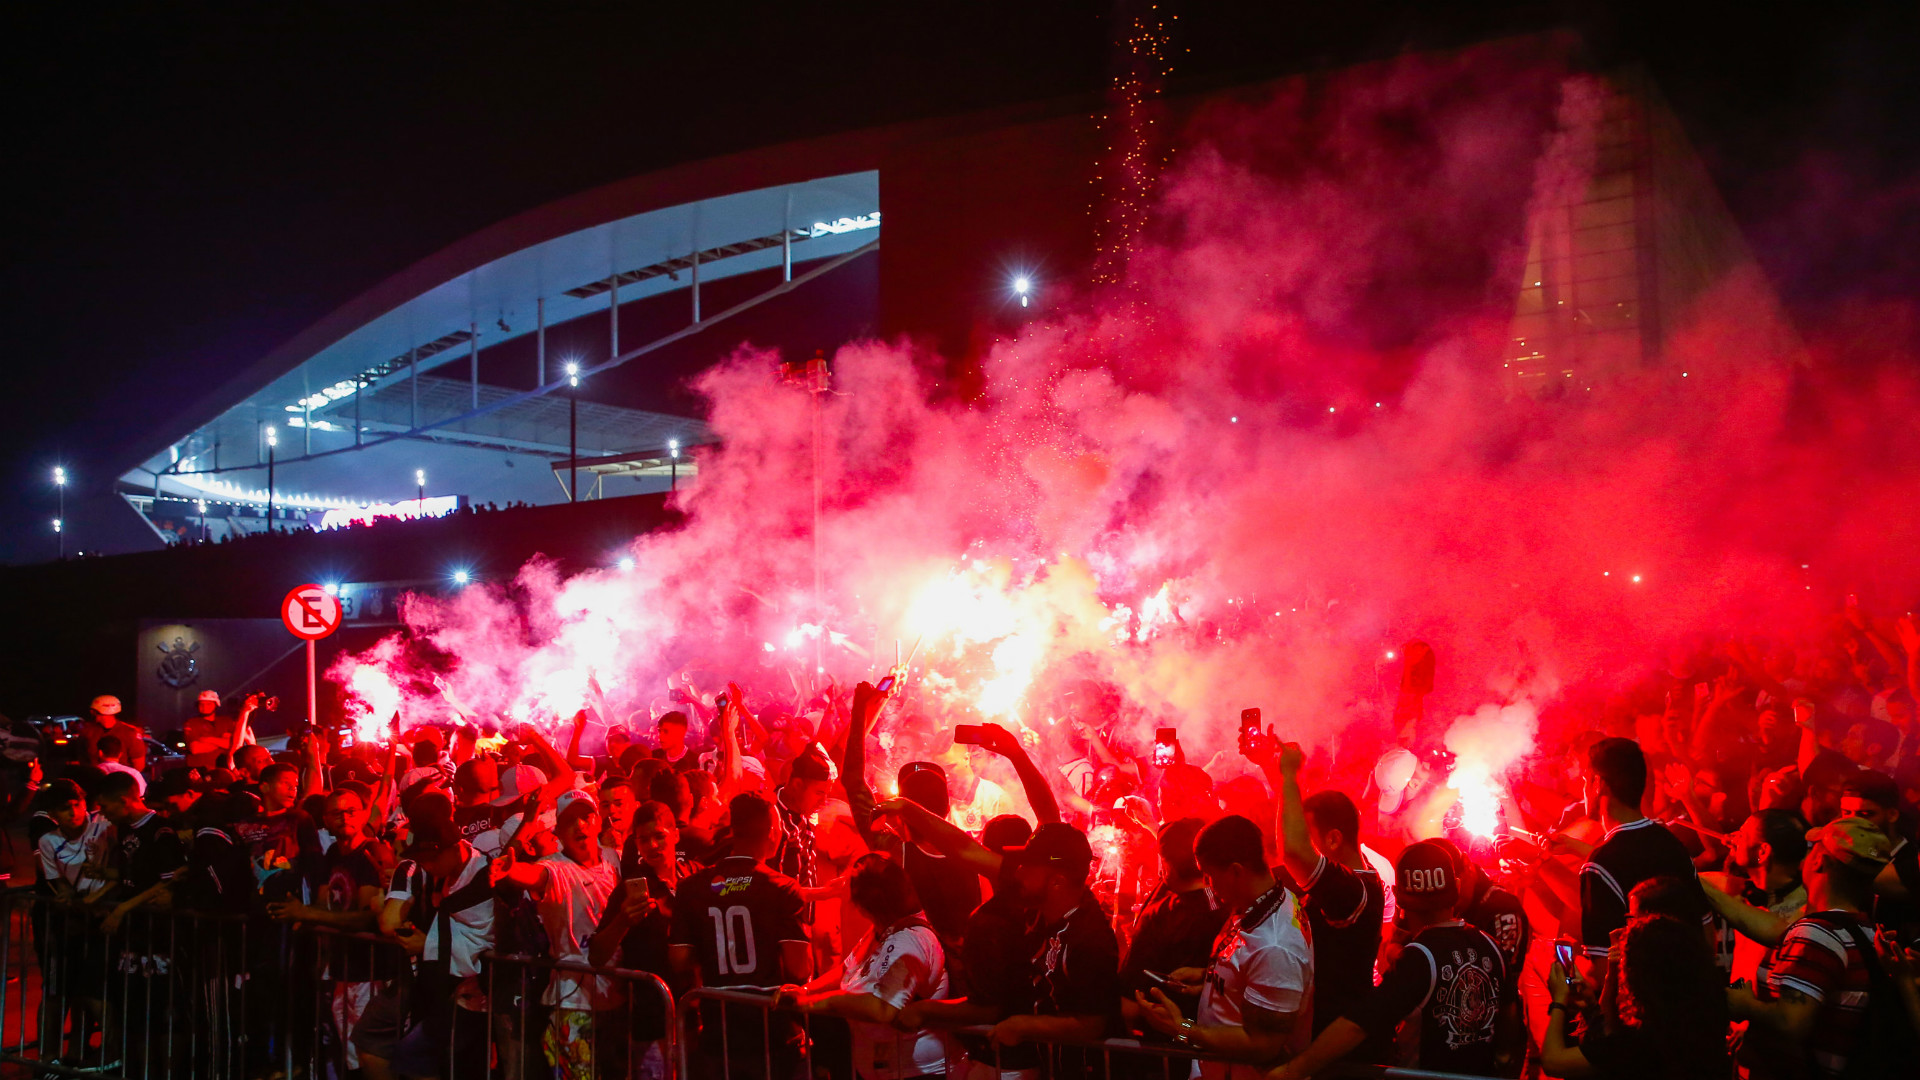 Arena Corinthians - Torcida - 27/09/2018